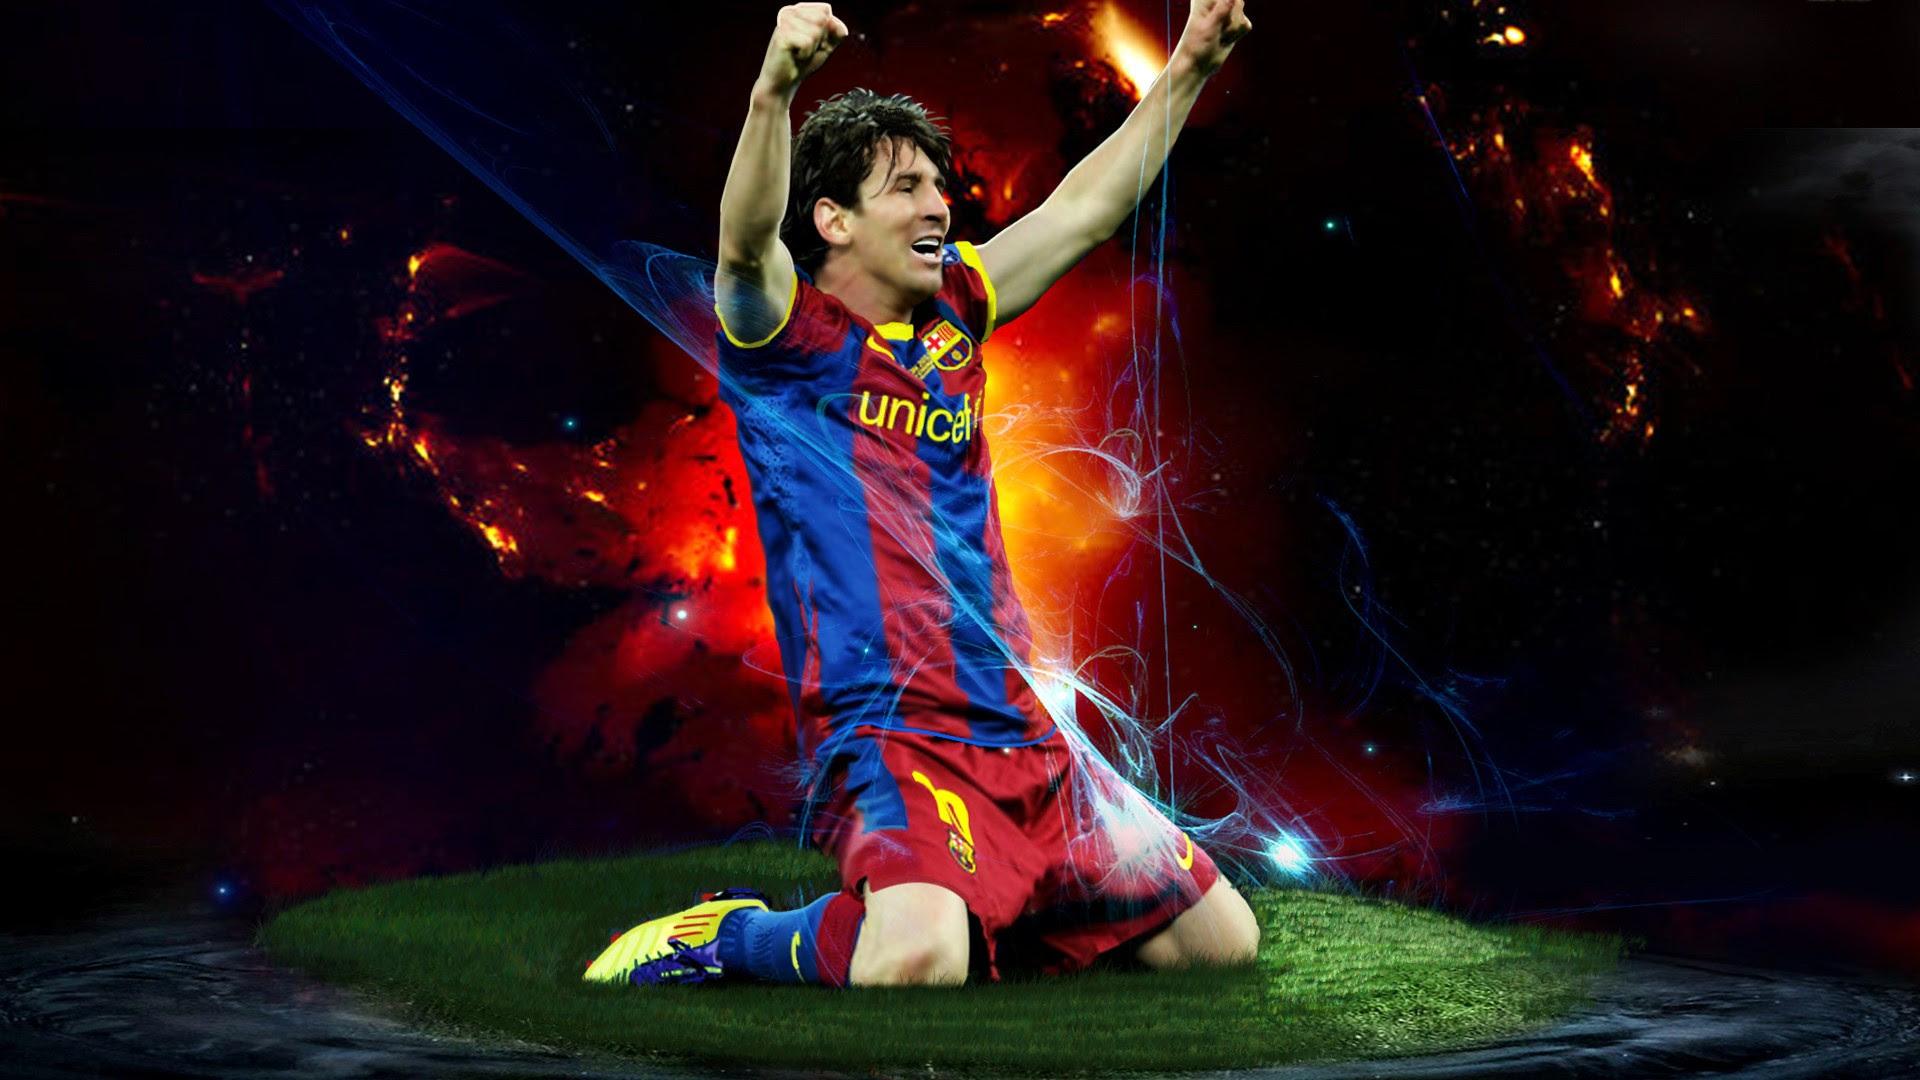 Full HD Lionel Messi 1920×1080 Wallpapers | PixelsTalk.Net